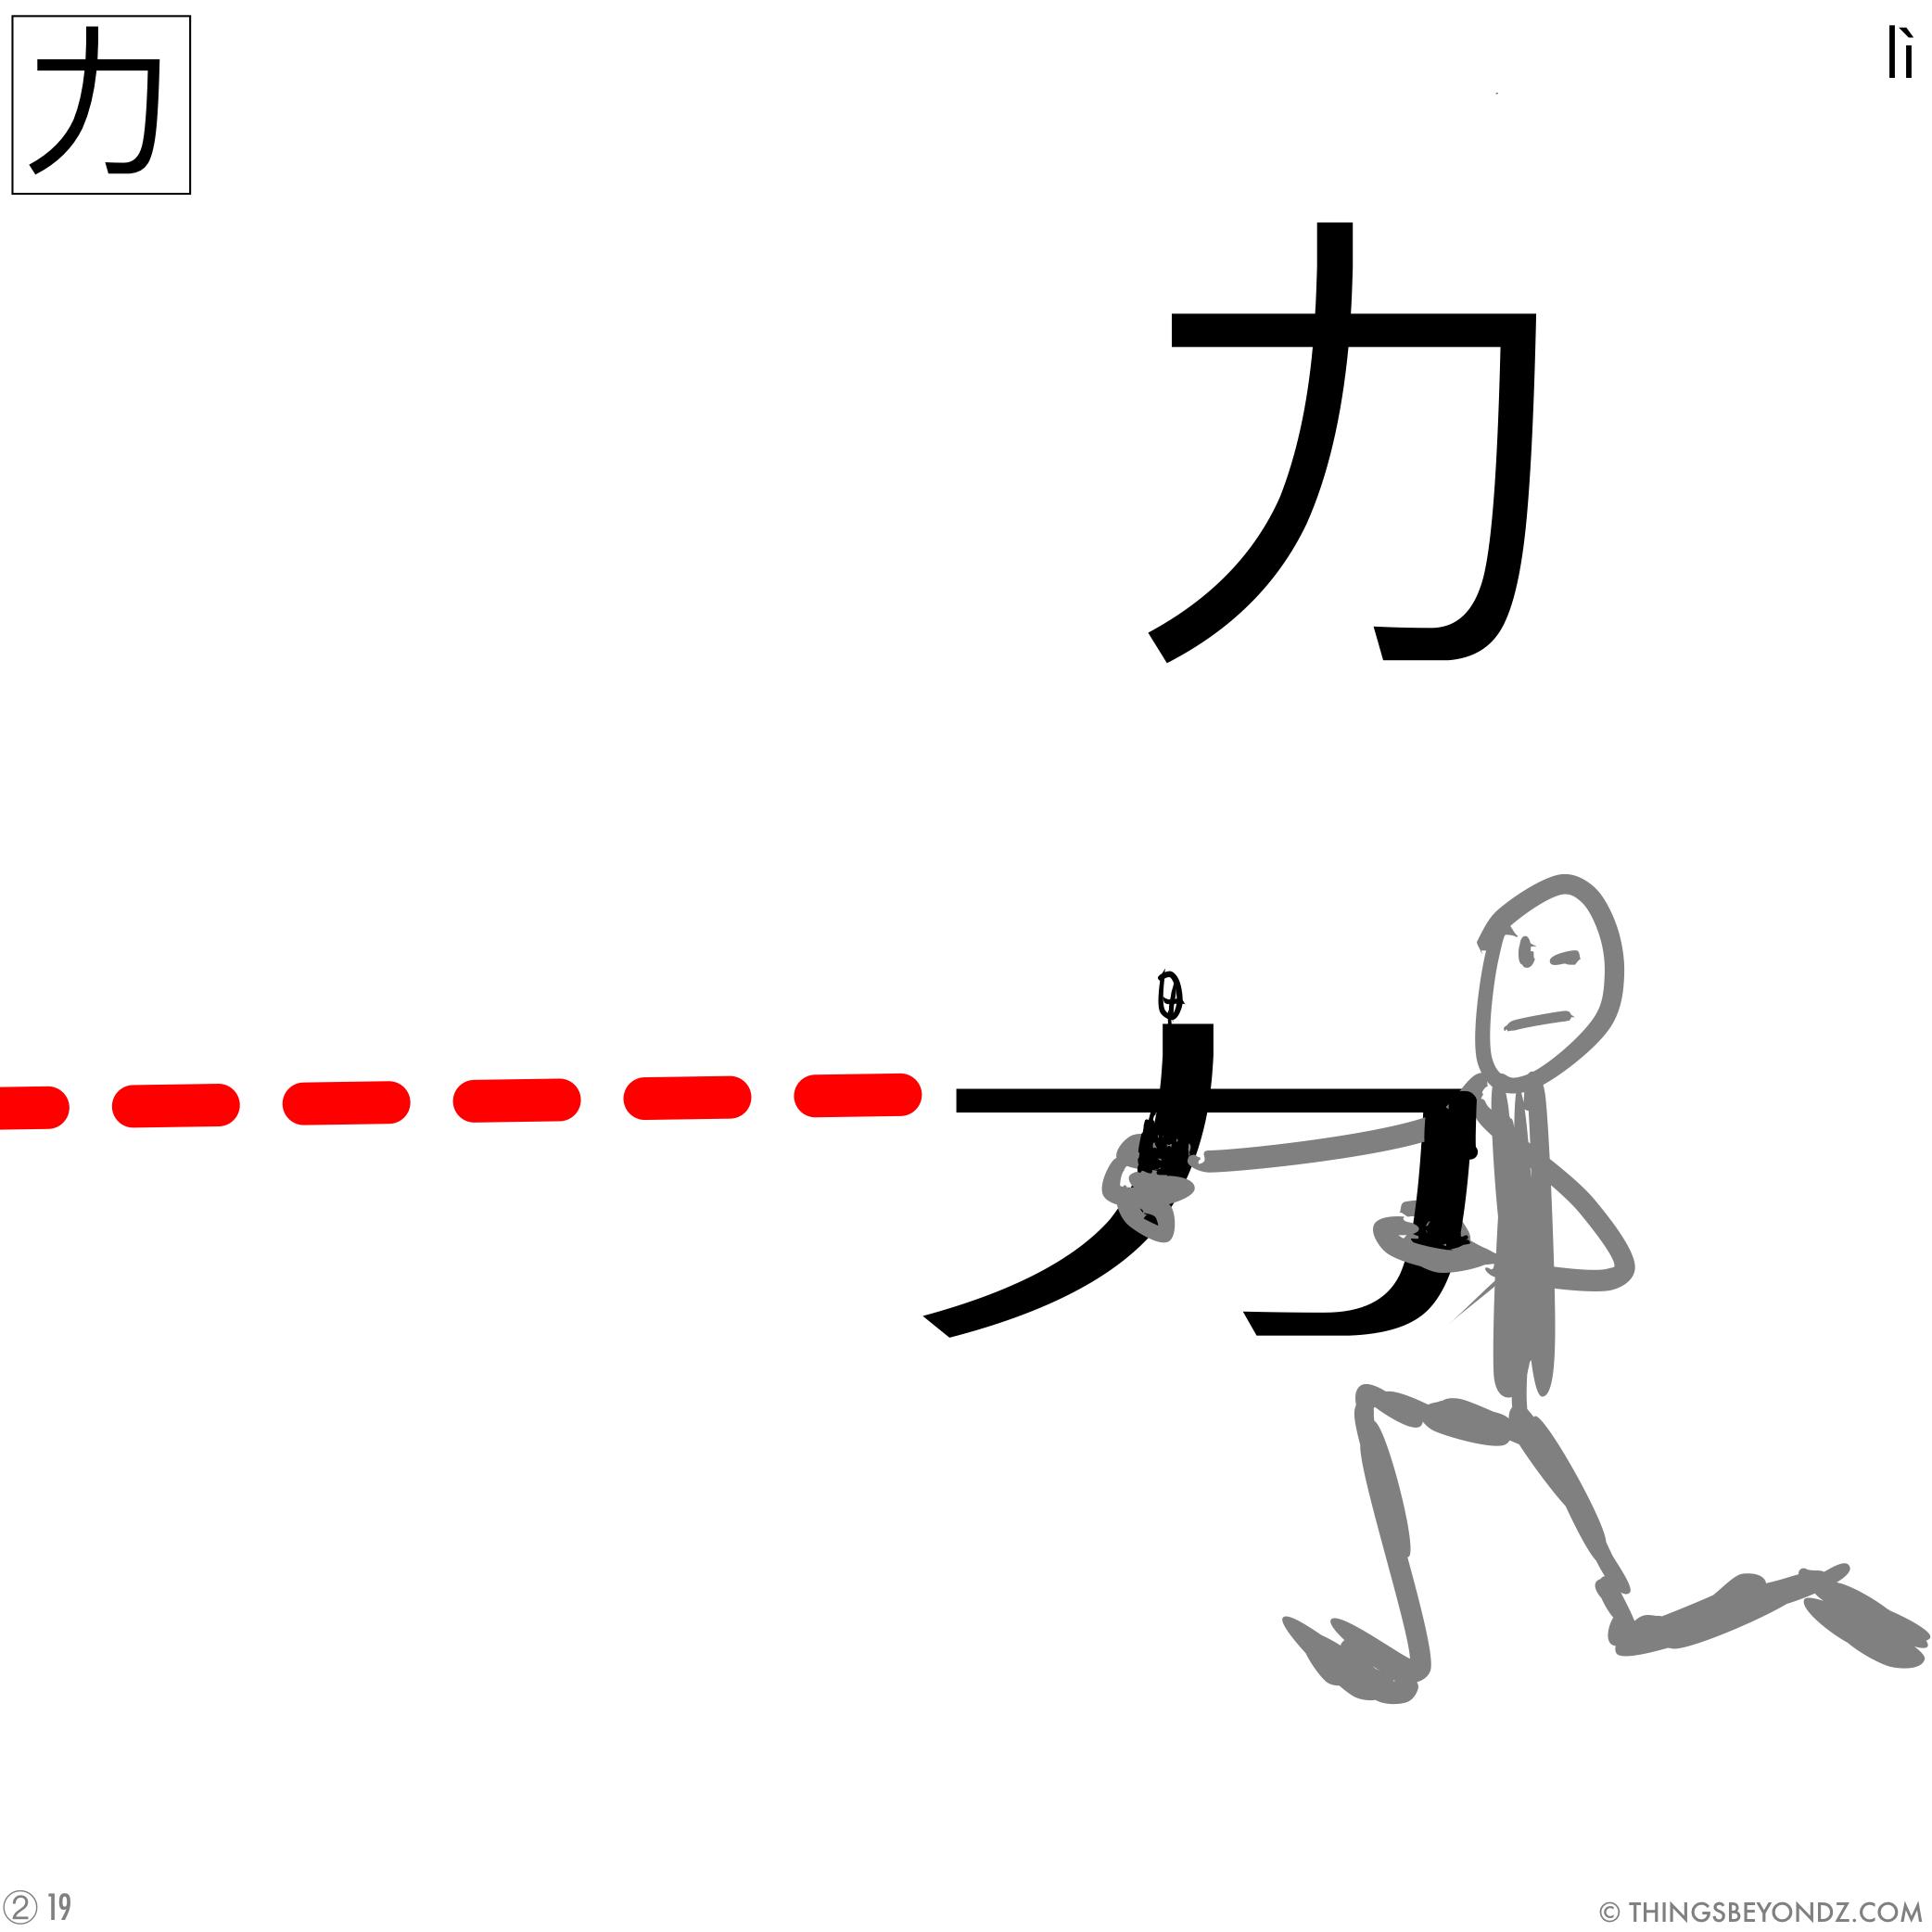 Kangxi Radical 19: 力 lì Power